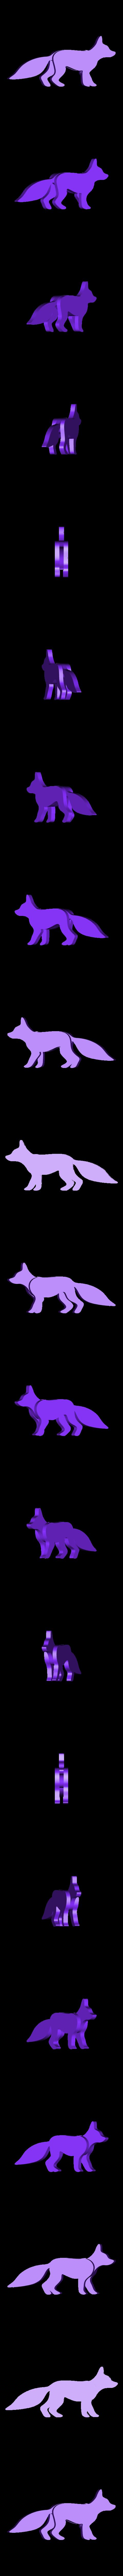 FoxPeace.stl Download STL file FoxPeace - Fox 3D / 3 layers • 3D print template, Hammed